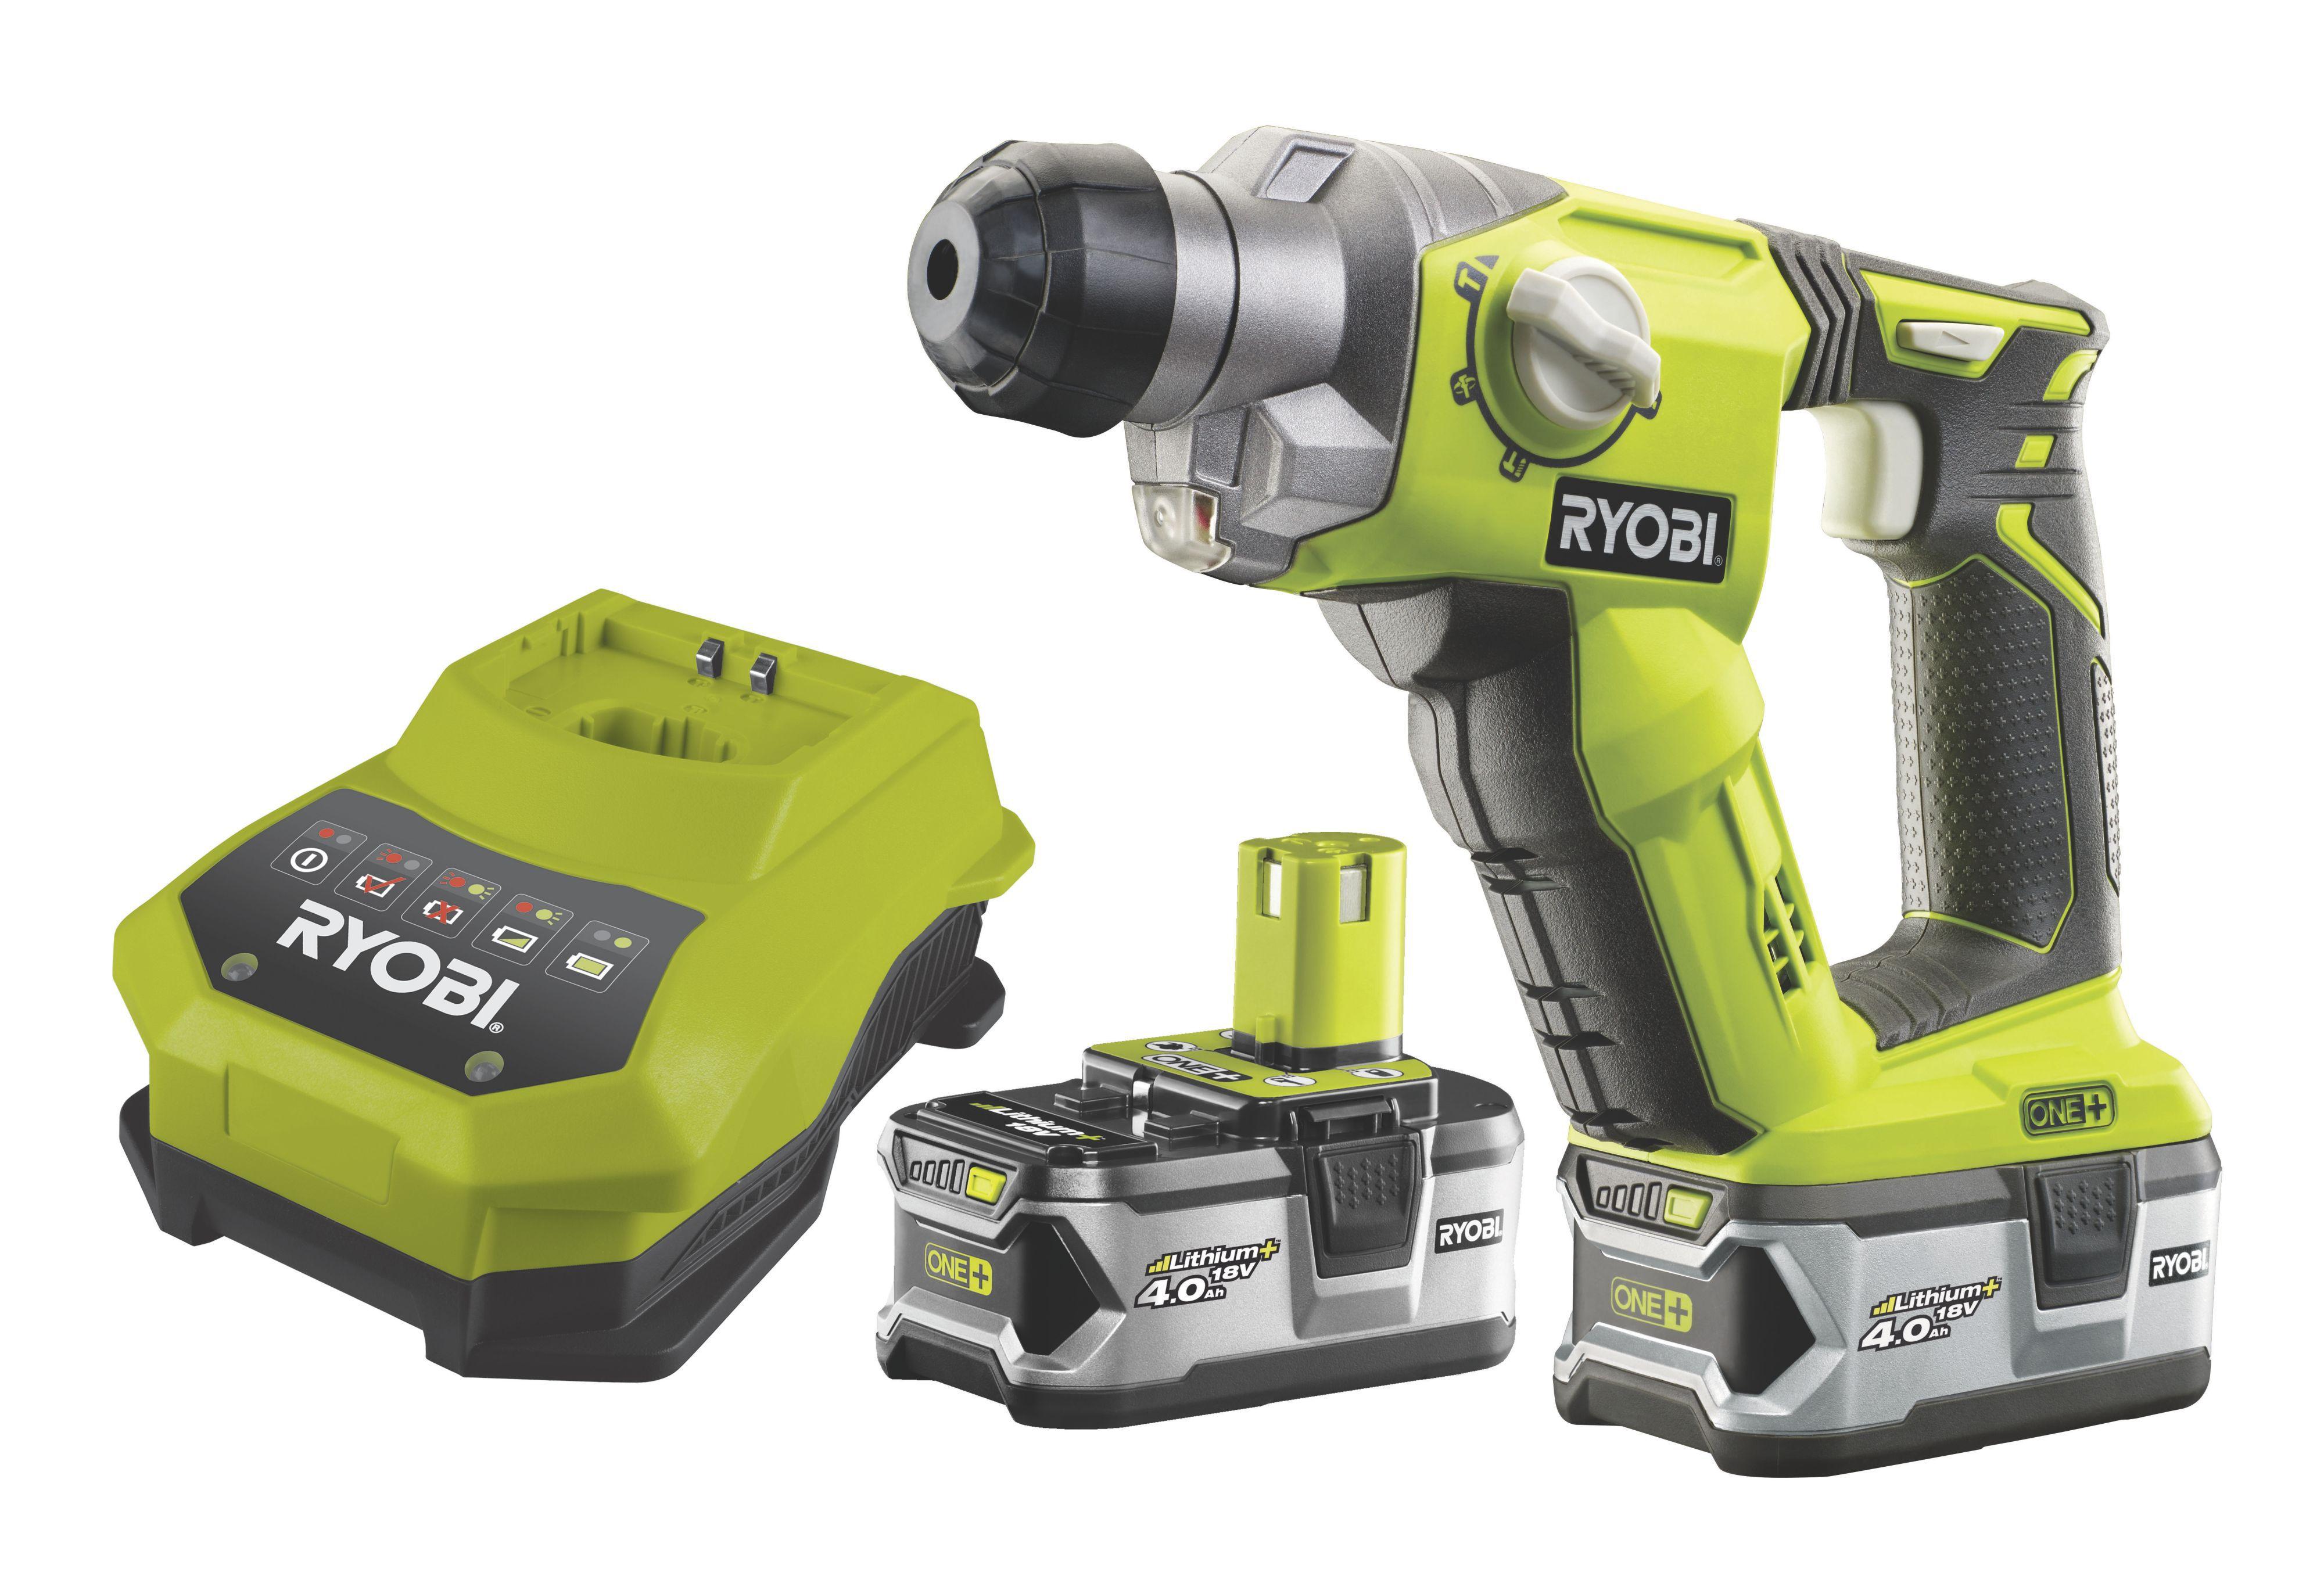 Ryobi One+ Cordless 18V 4Ah Li-ion SDS plus drill 2 batteries R18SDS-LL40S  | Departments | DIY at B&Q